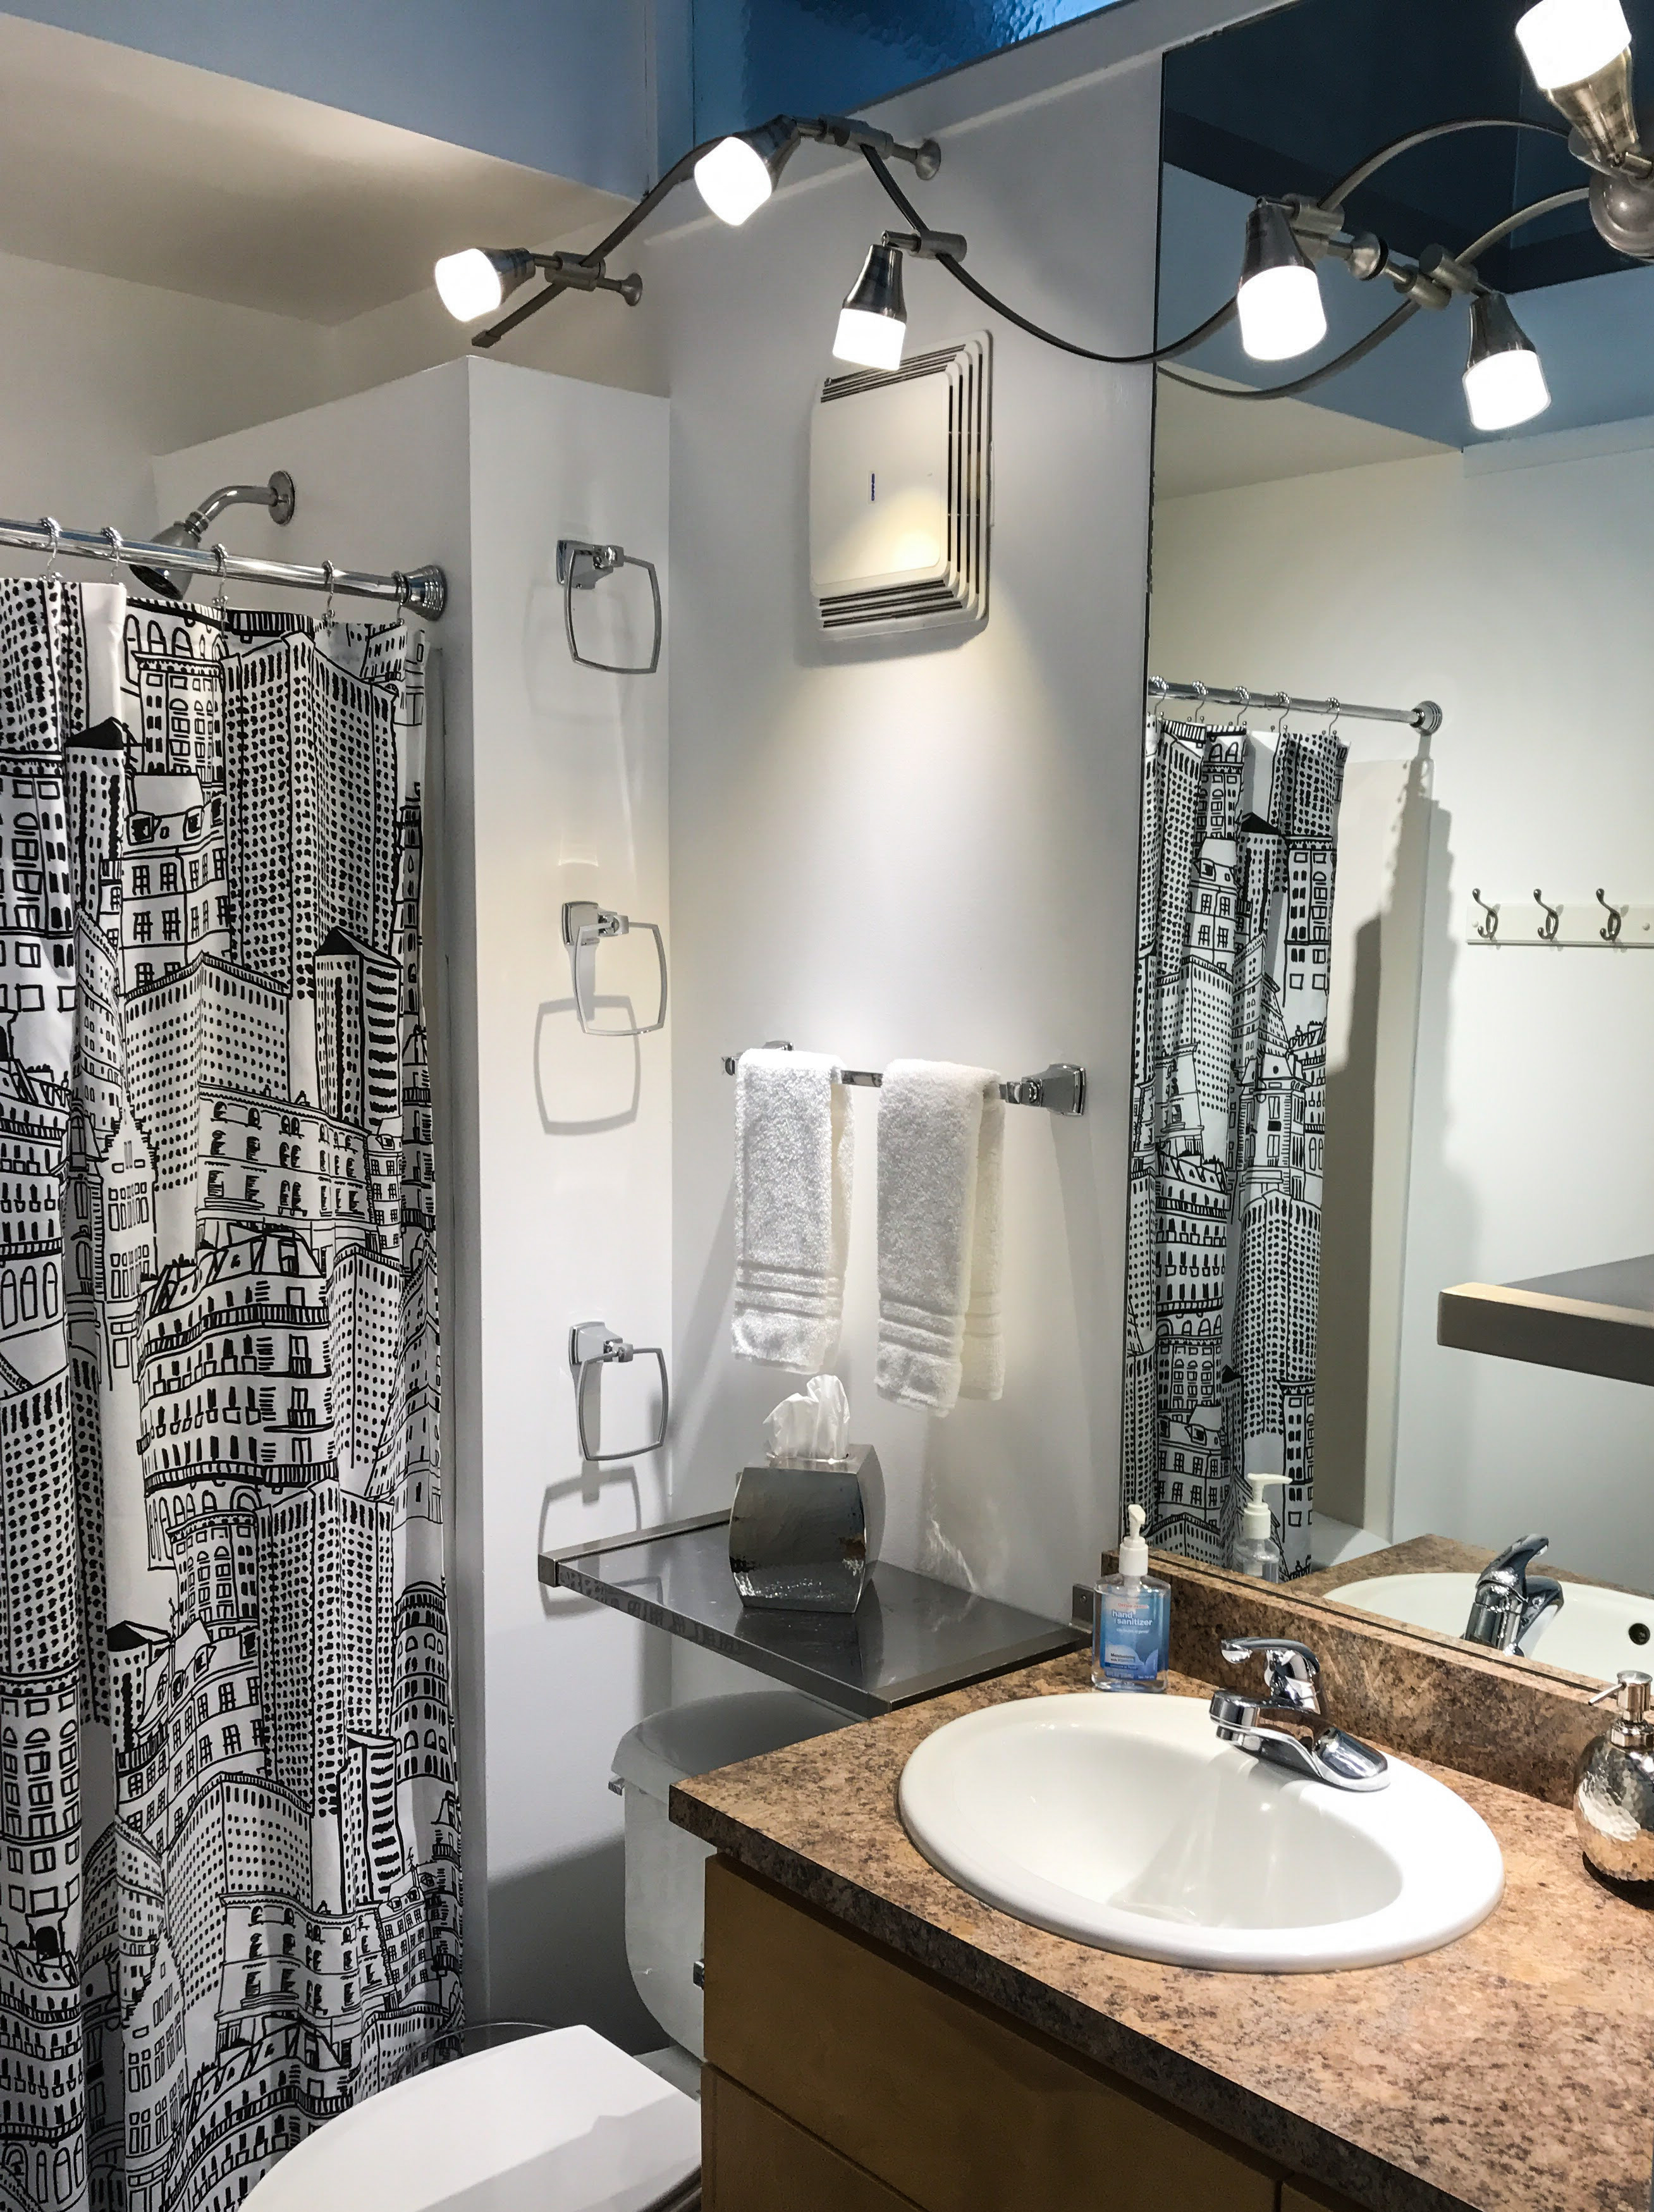 Loft Reverie Hotel 801 - Bathroom